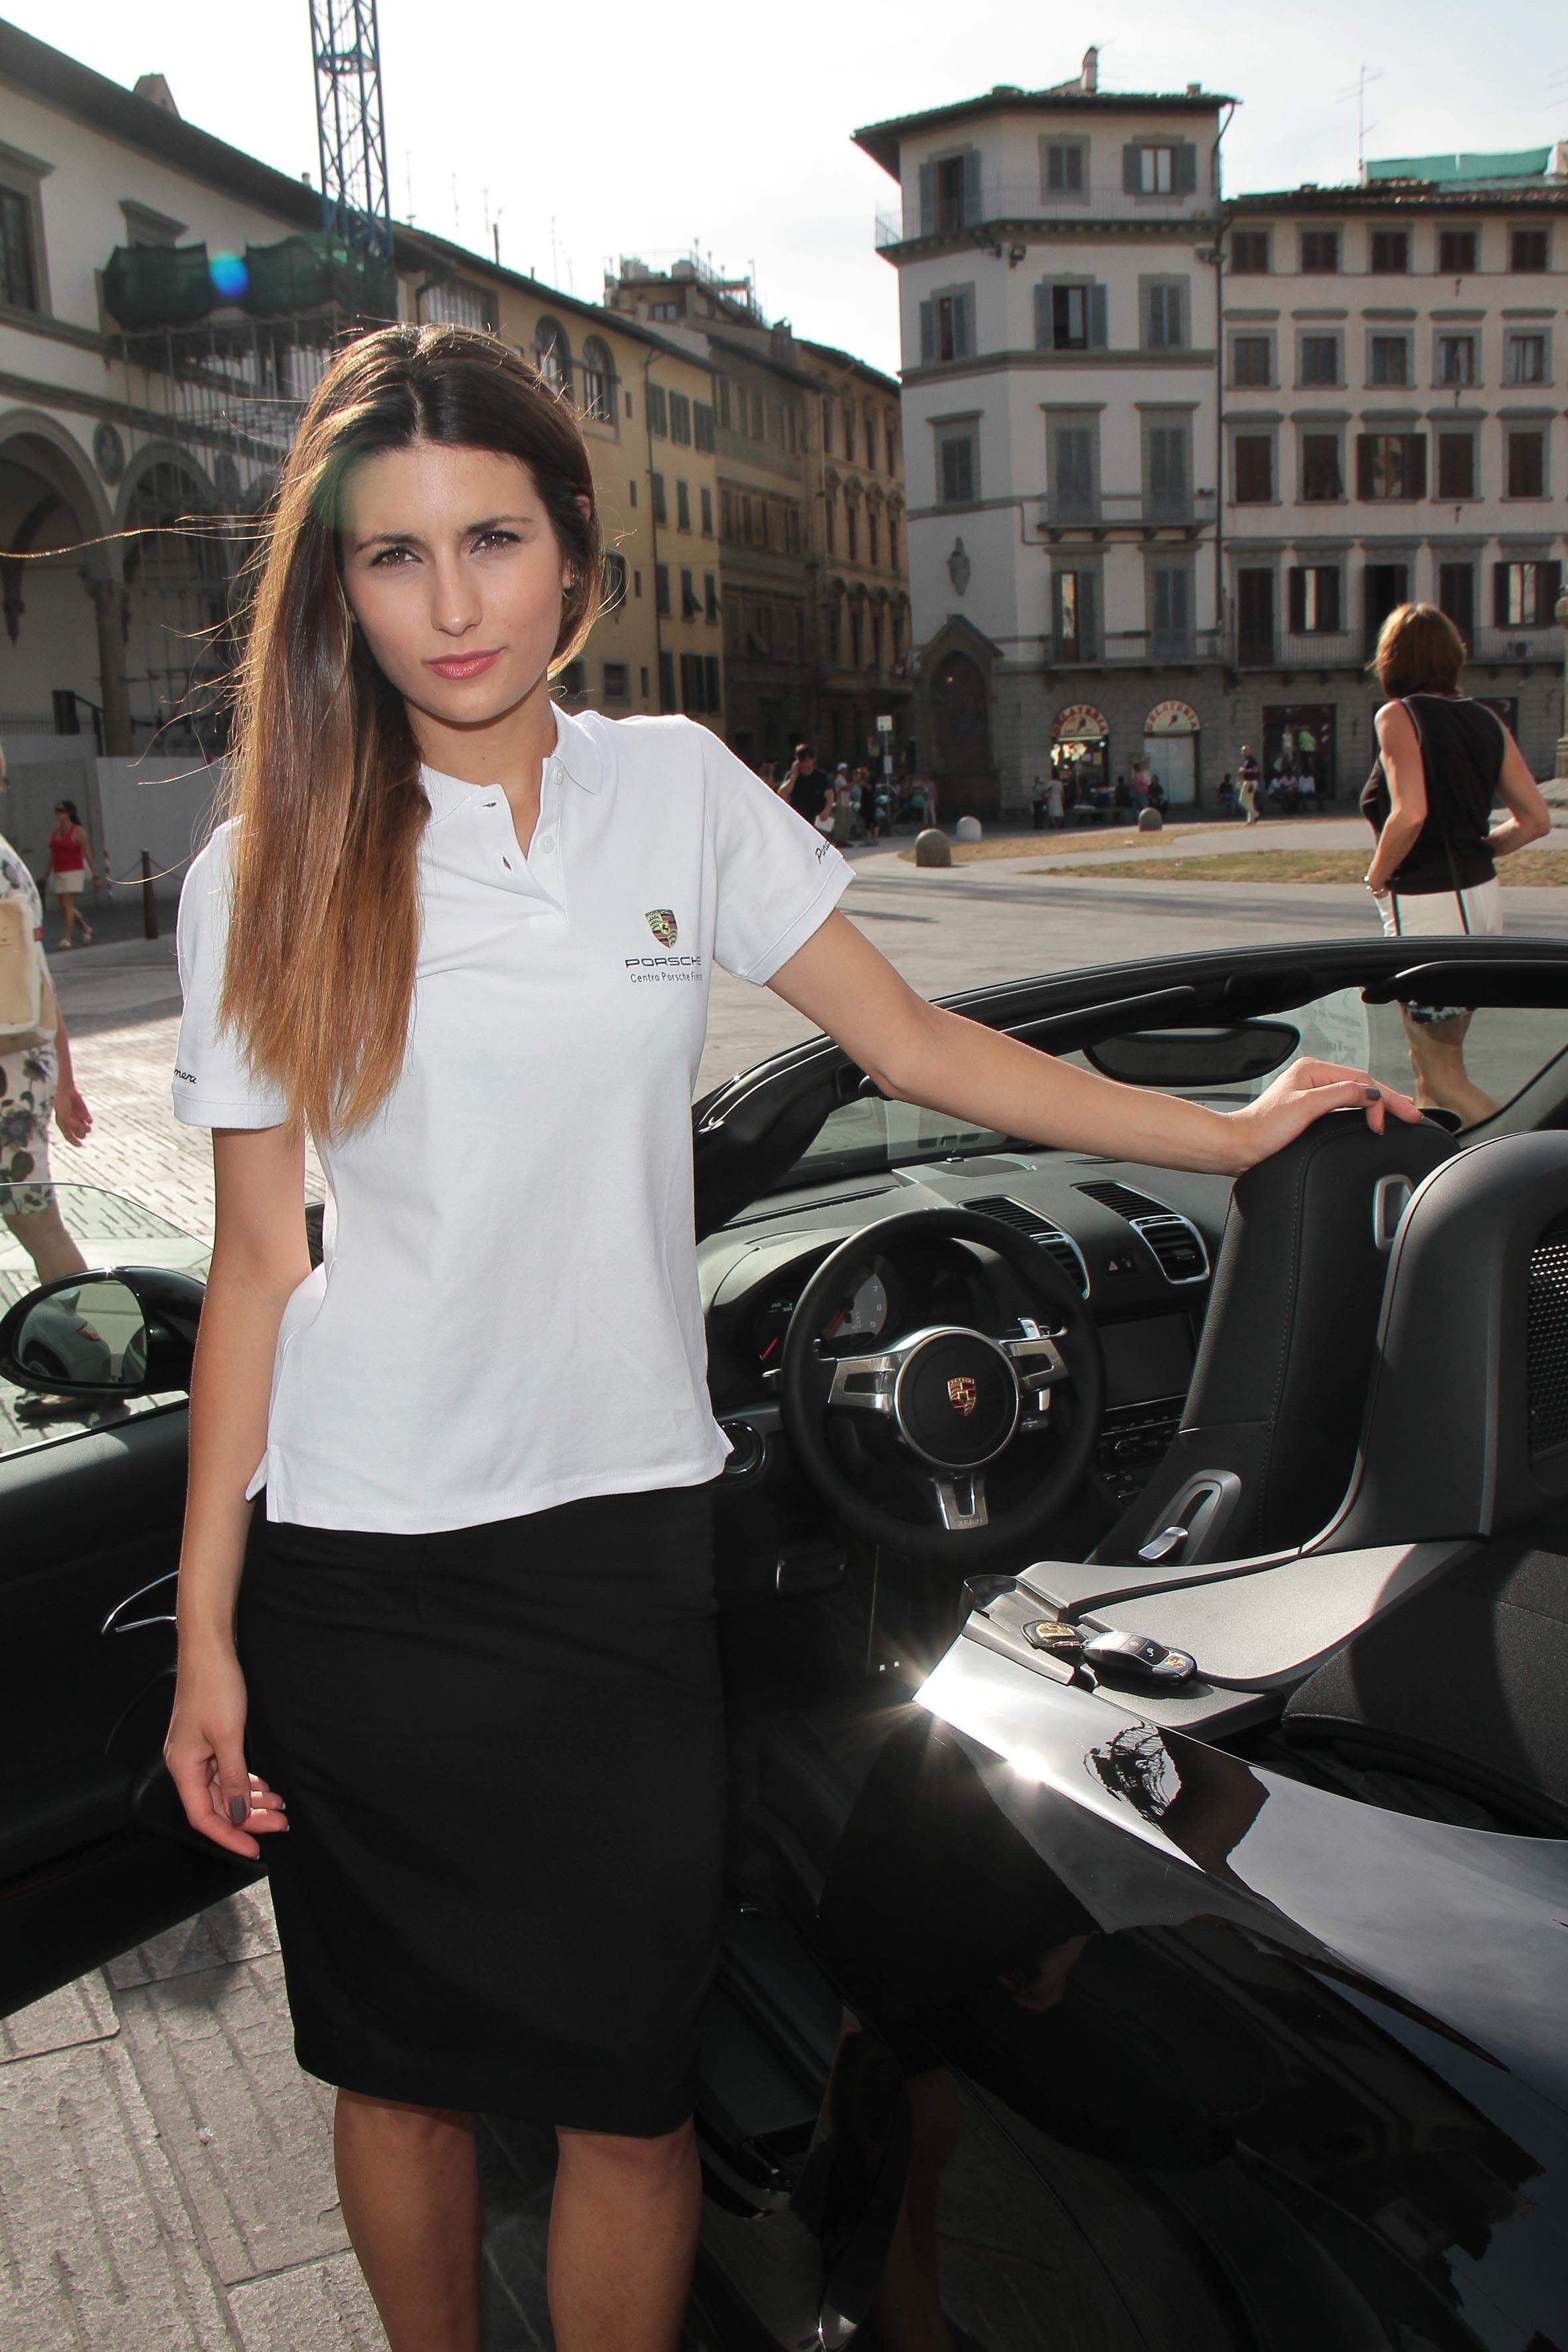 PRESSPHOTO Firenze, JK Place, Toscana Sommelier. Nella foto Porsche giuseppe cabras/new press photo